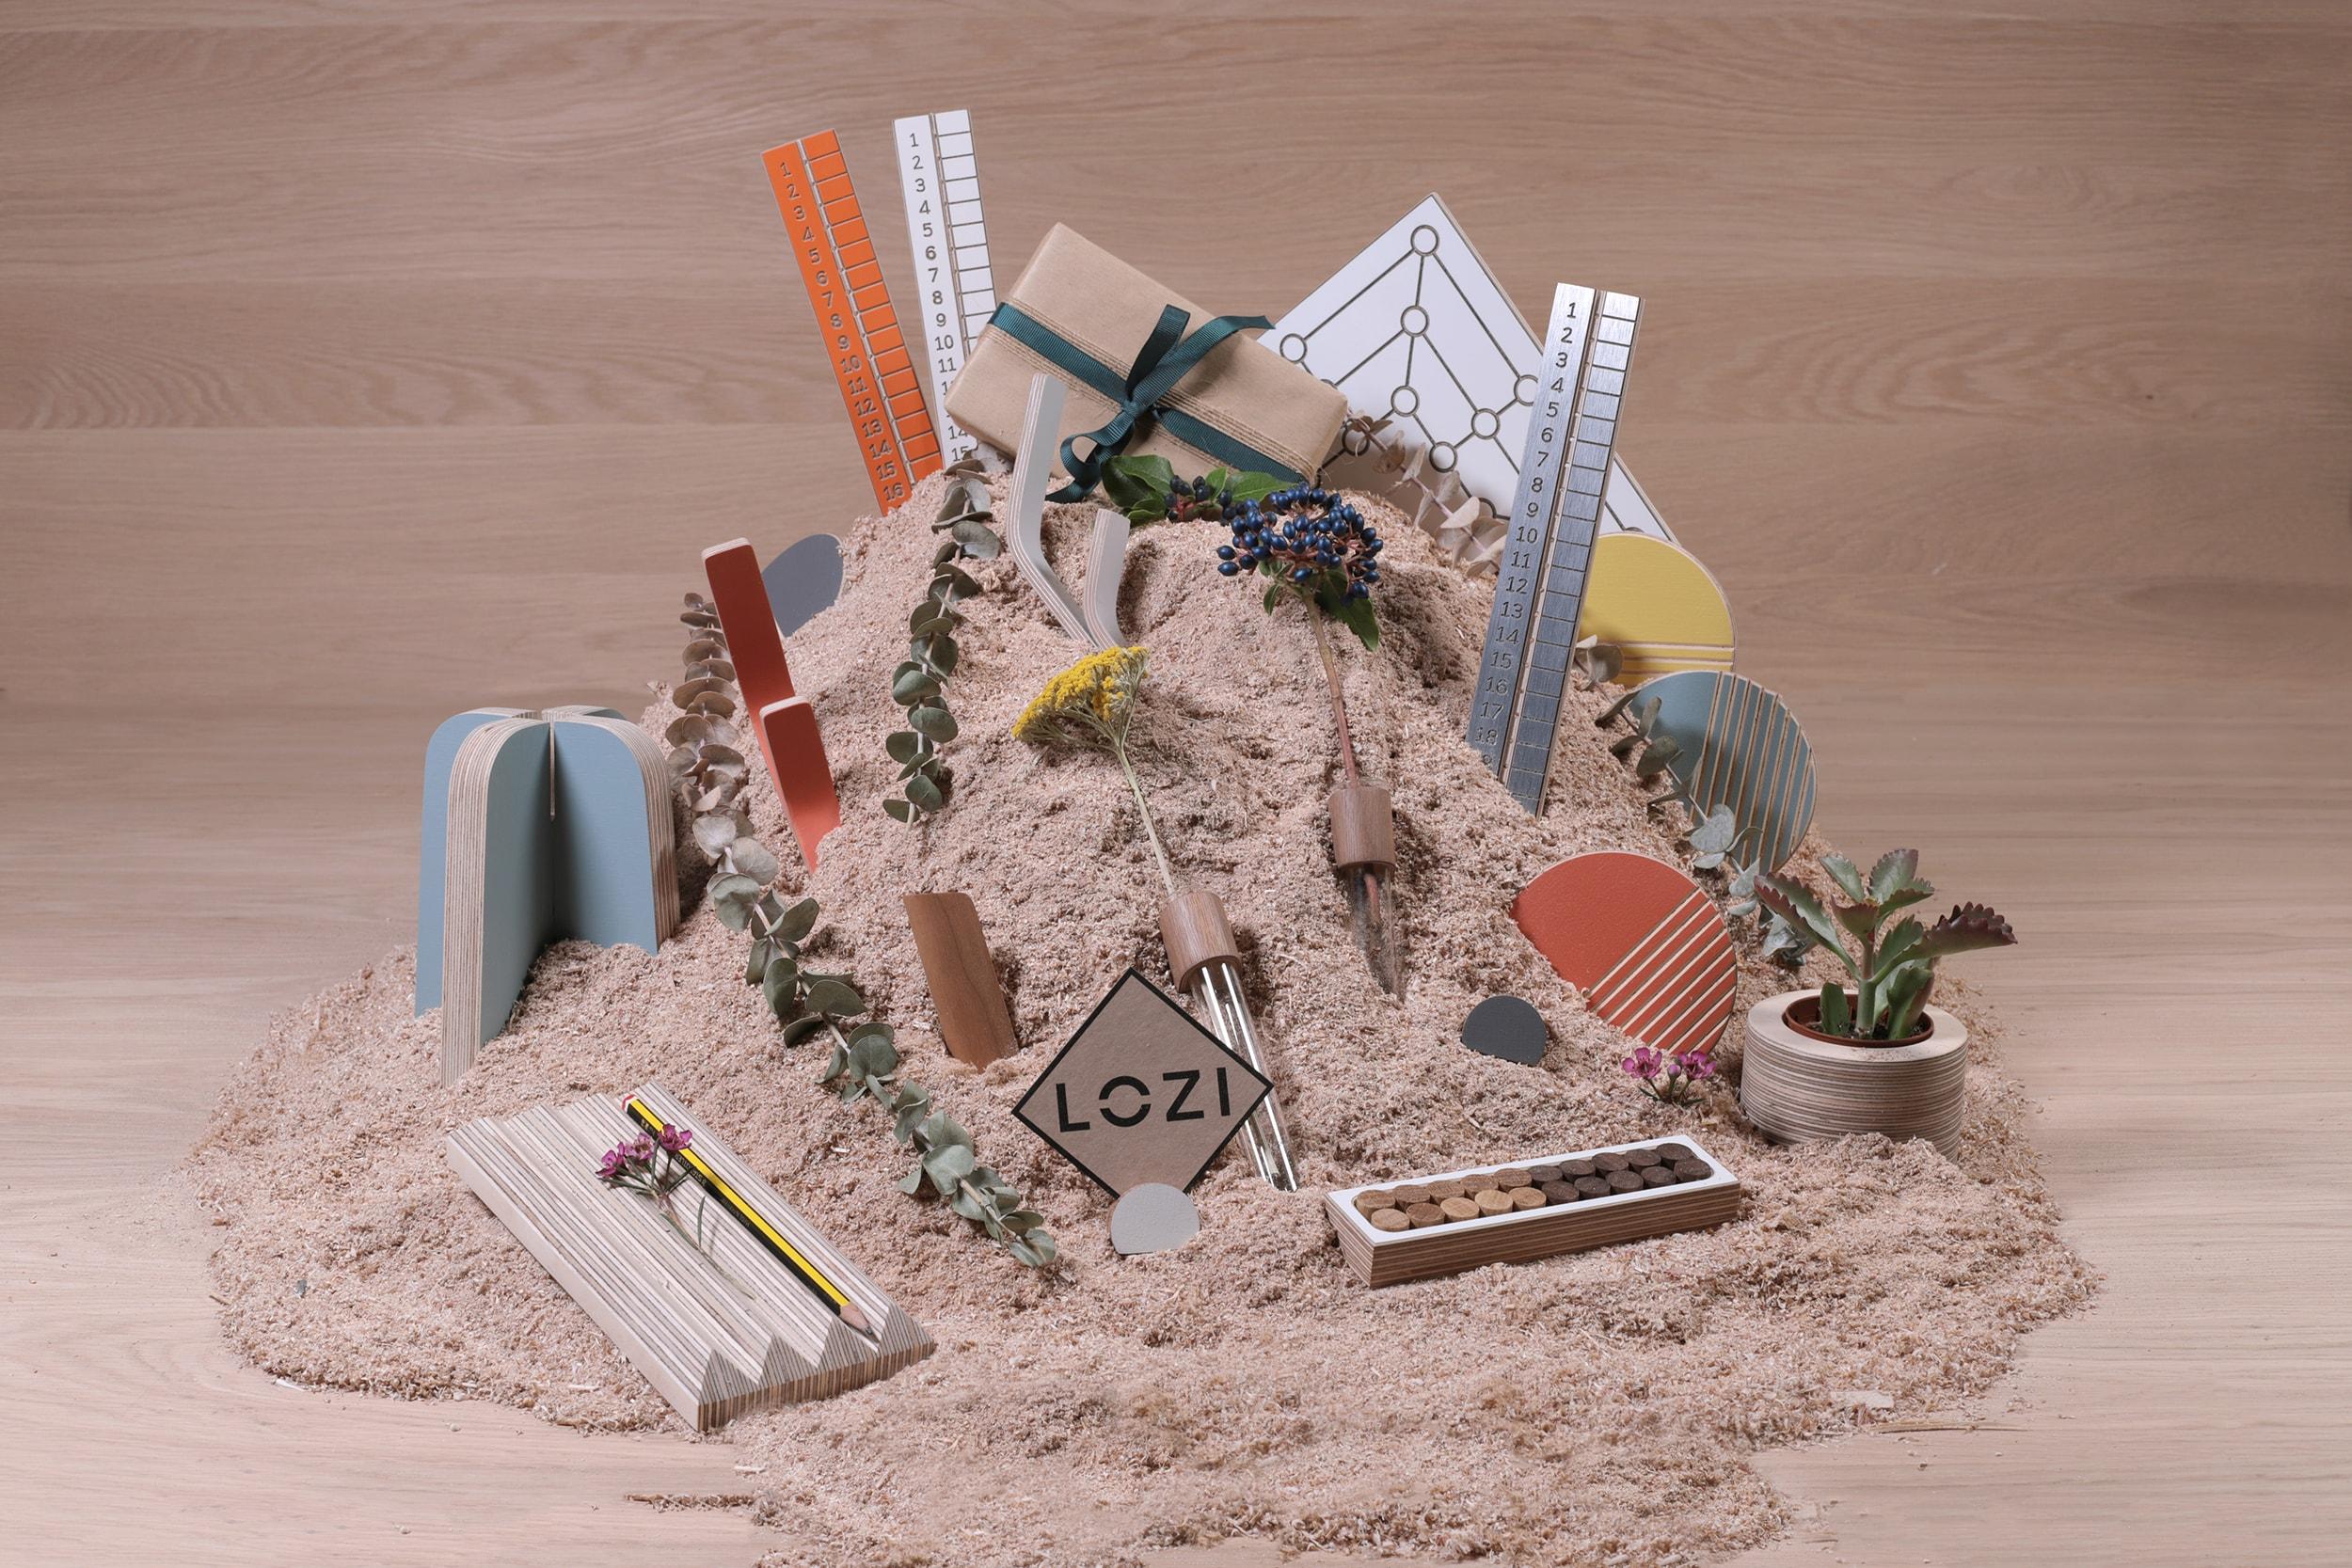 Sawdust pile WEB-min-2.jpg